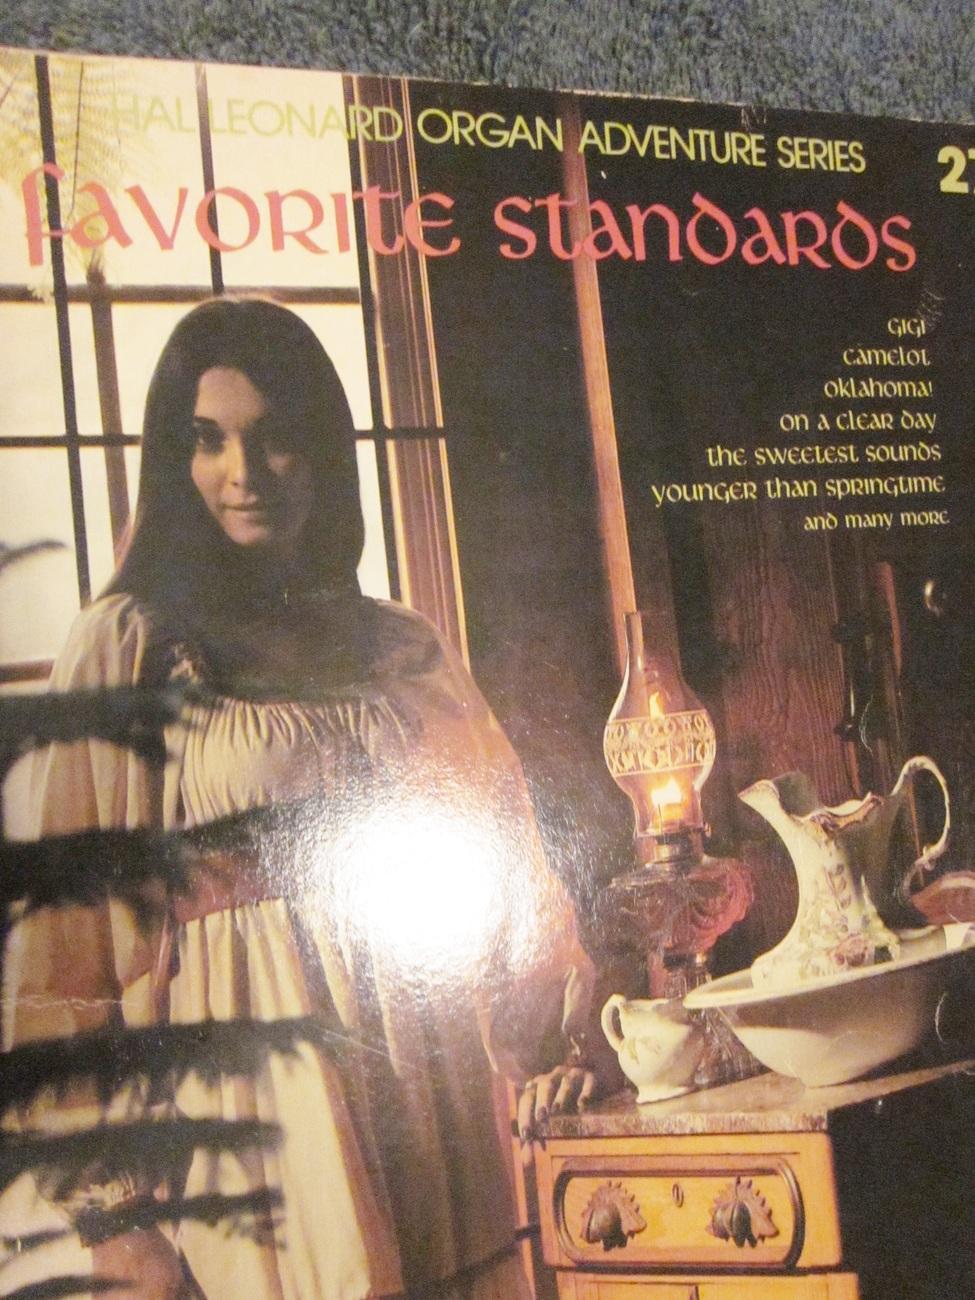 Hal Leonard Favorite Standards Organ Adventures No. 27 - 1982